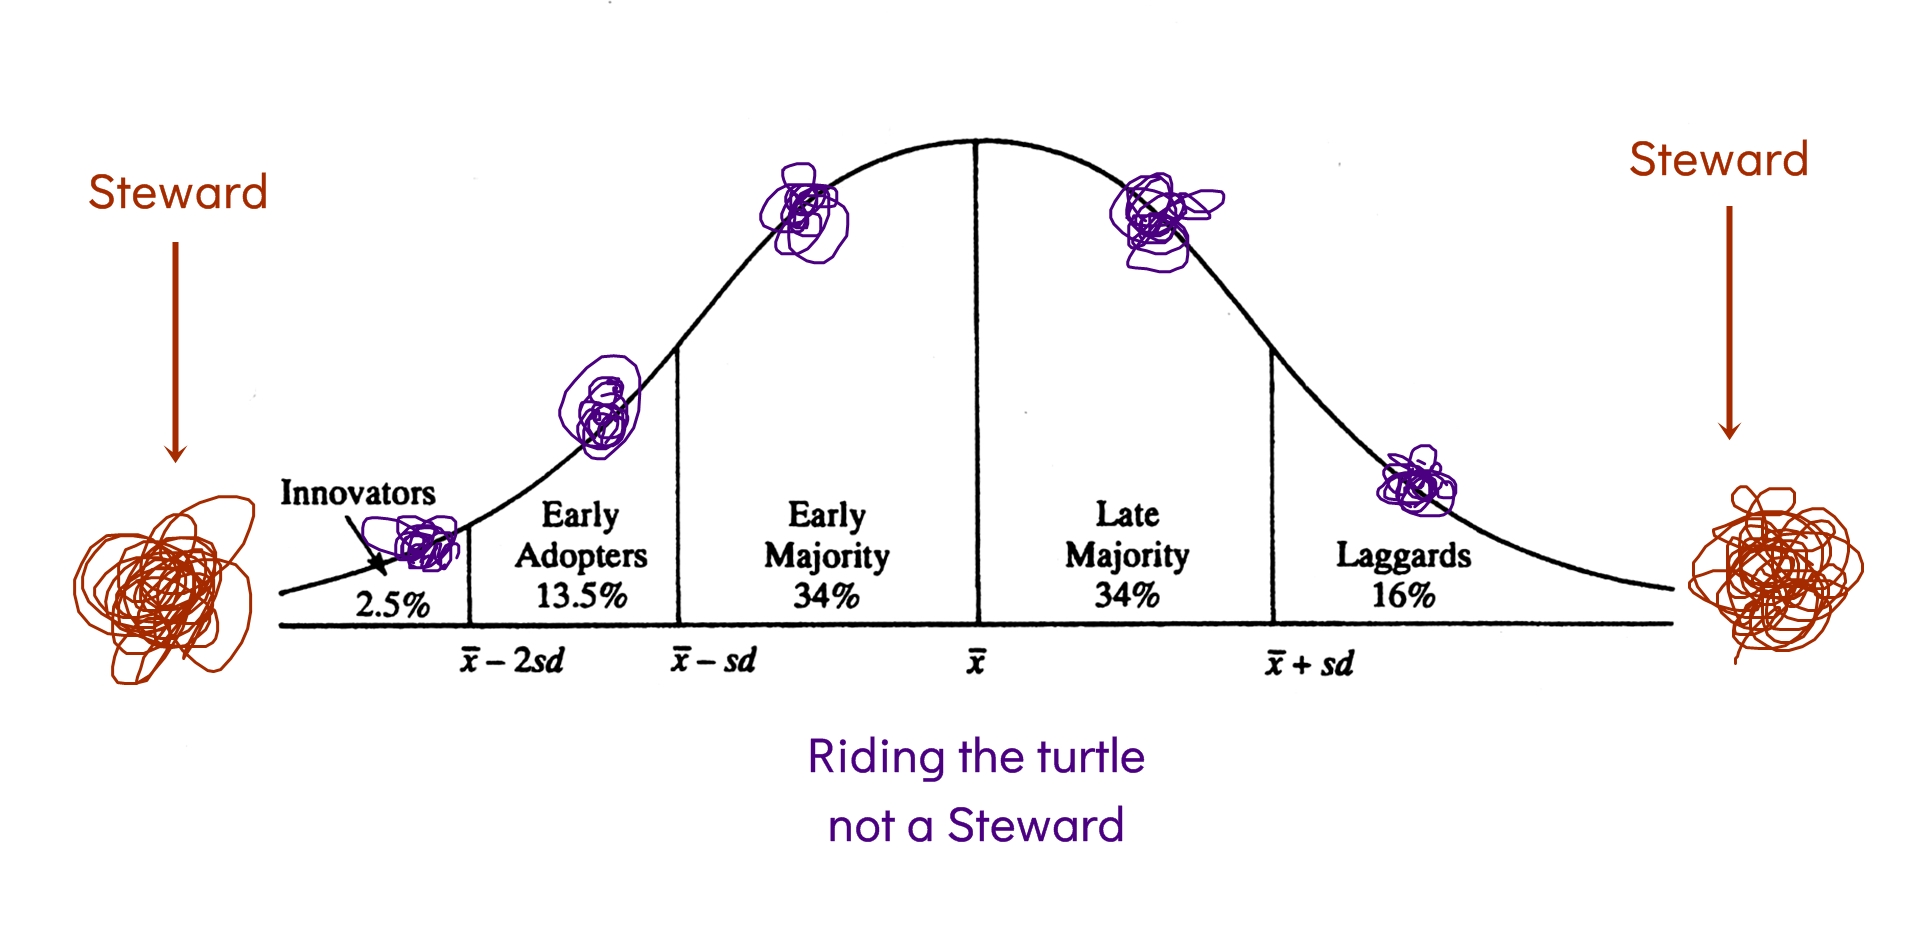 http://spiralsociety.org/wp-content/uploads/2019/10/turtle.jpg